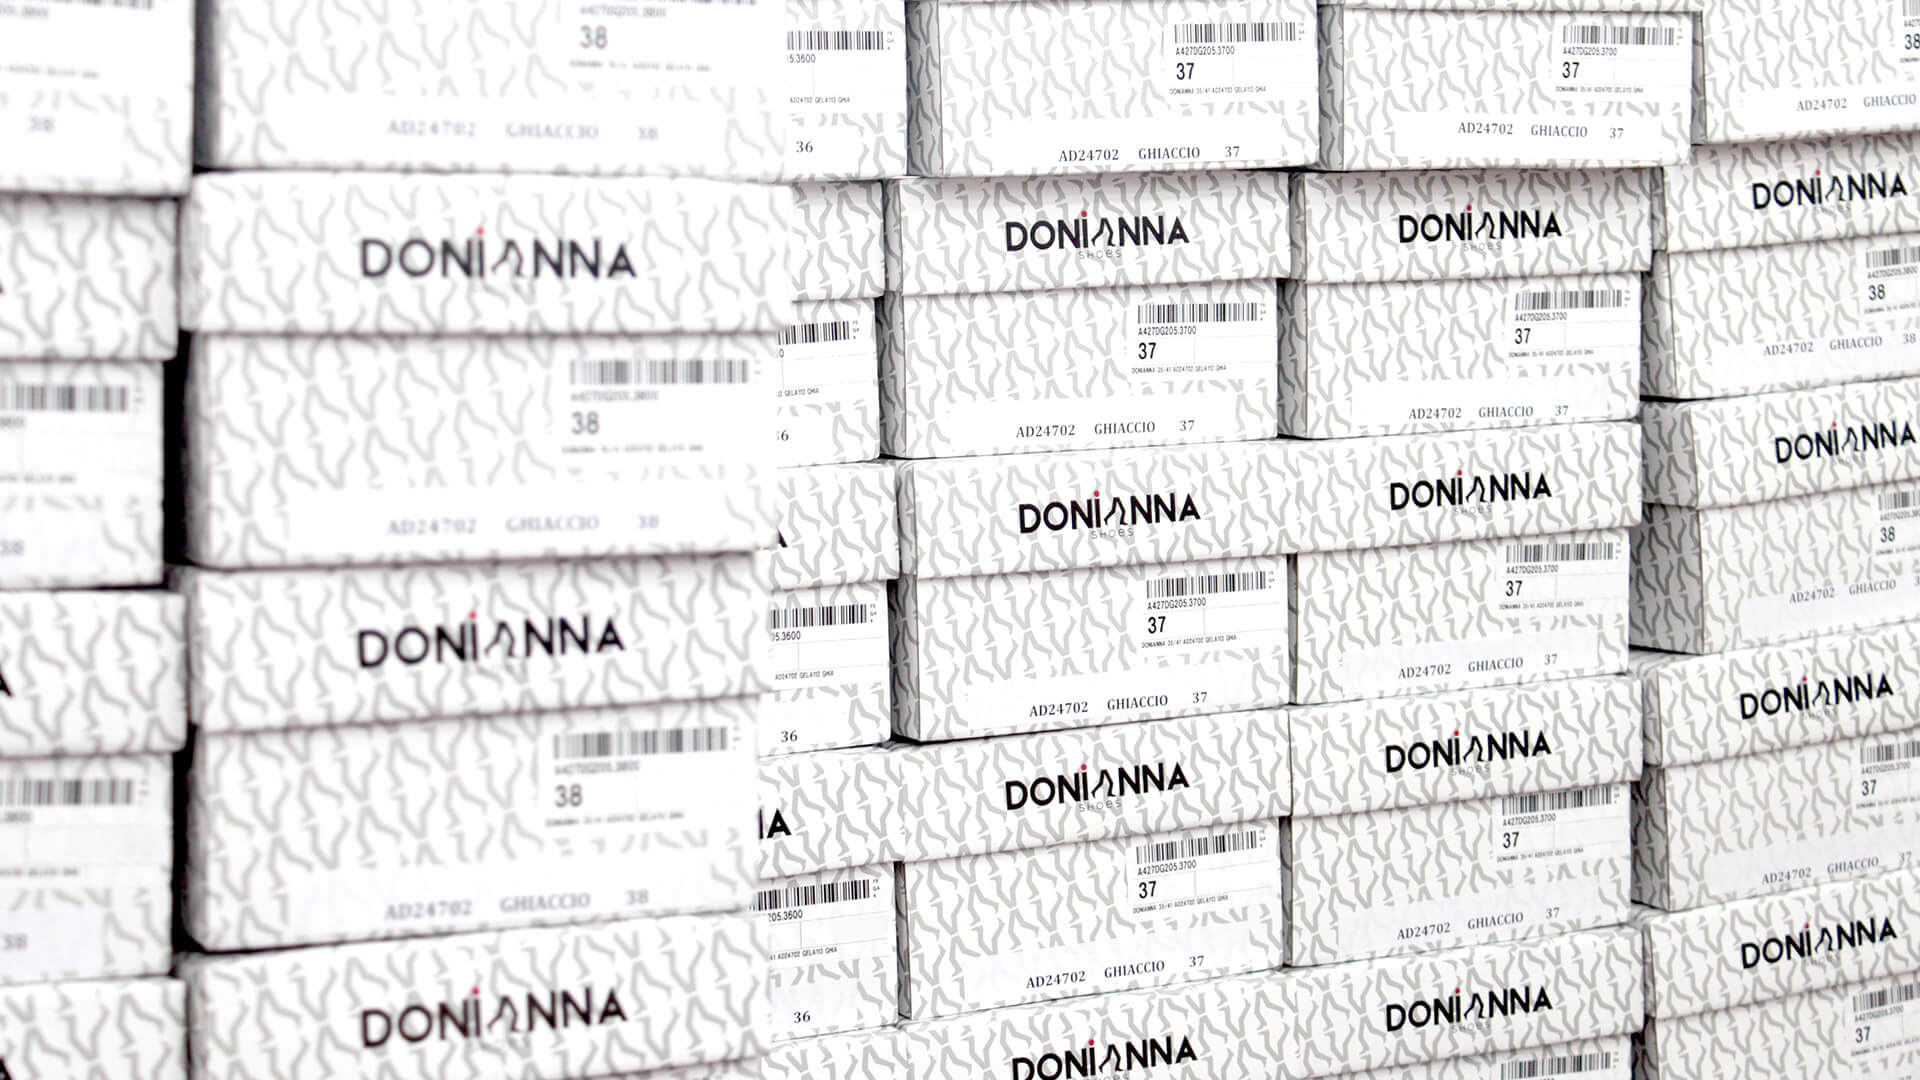 donianna_media_gallery_img_02